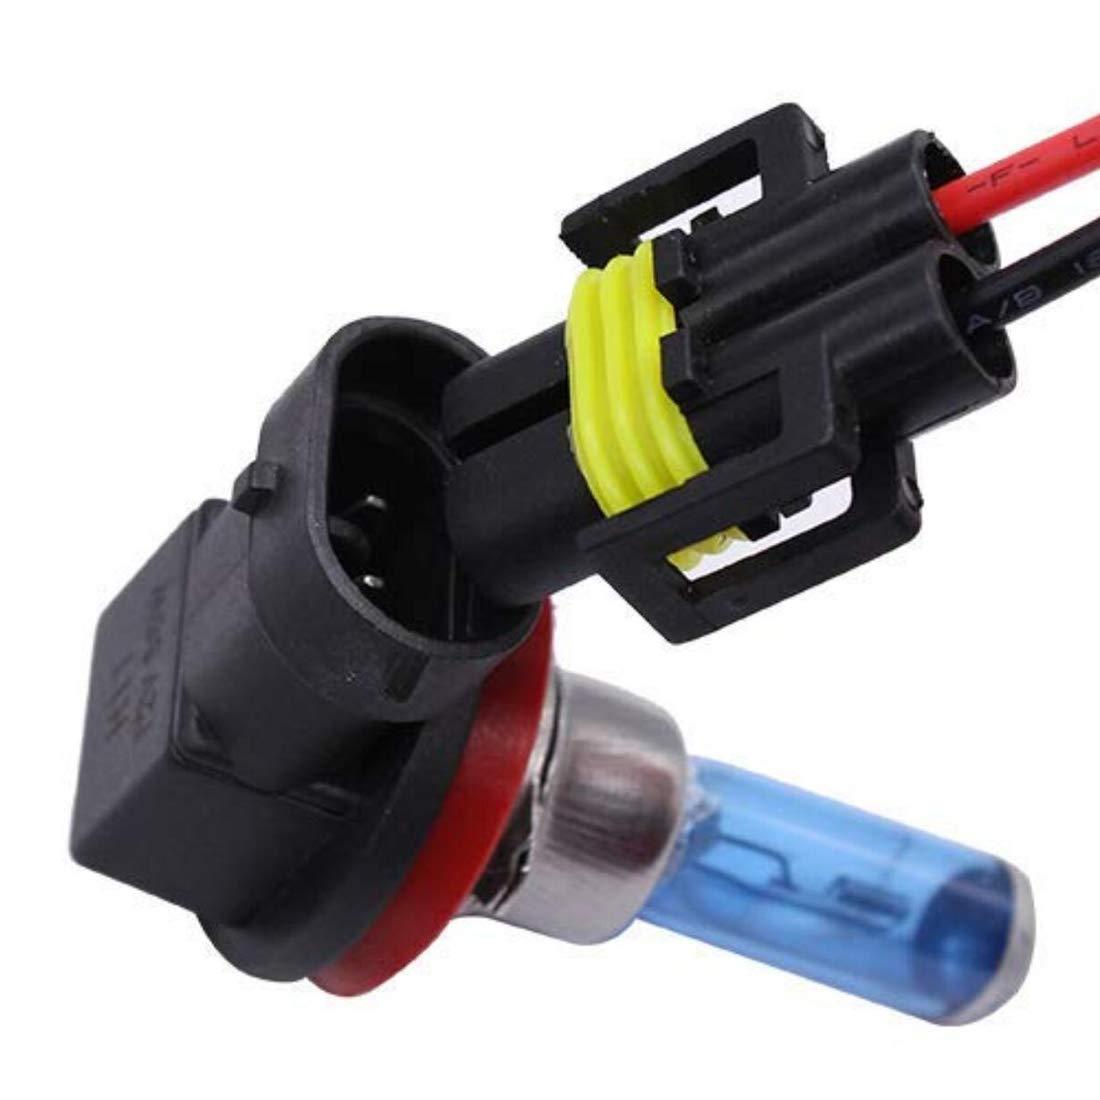 UTSAUTO H11 H8 880 881 Female Adapter Wiring Harness Sockets Wire 12V for Headlights Fog Lights 4pcs